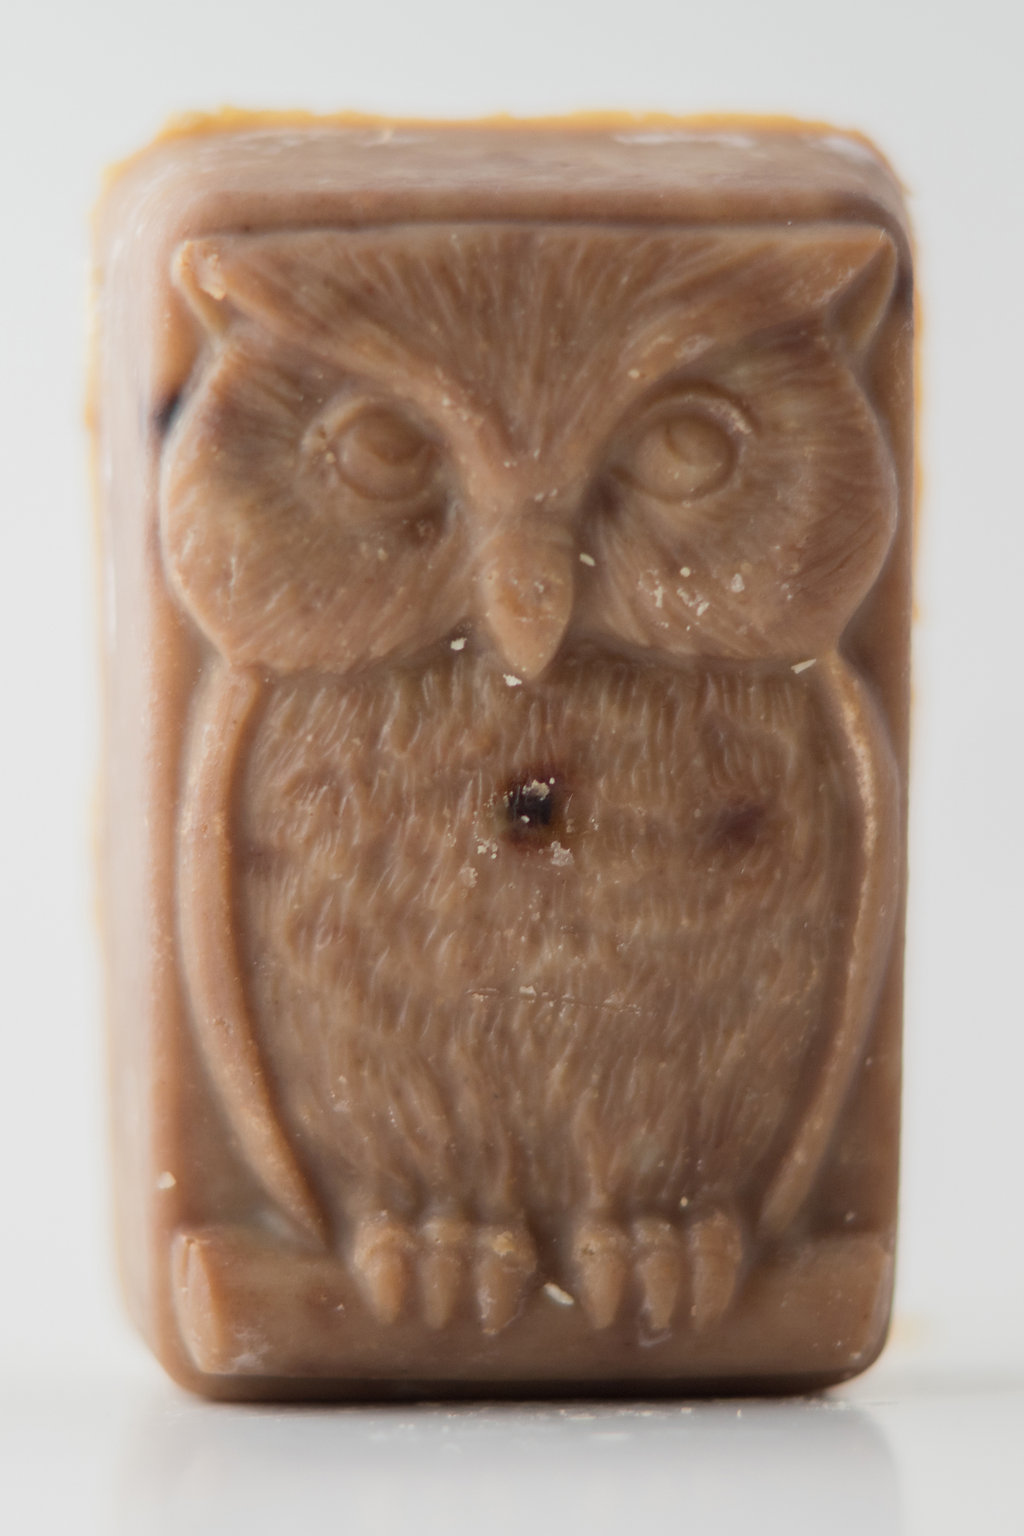 Serenity Soapworks Owl Goat Milk Soap